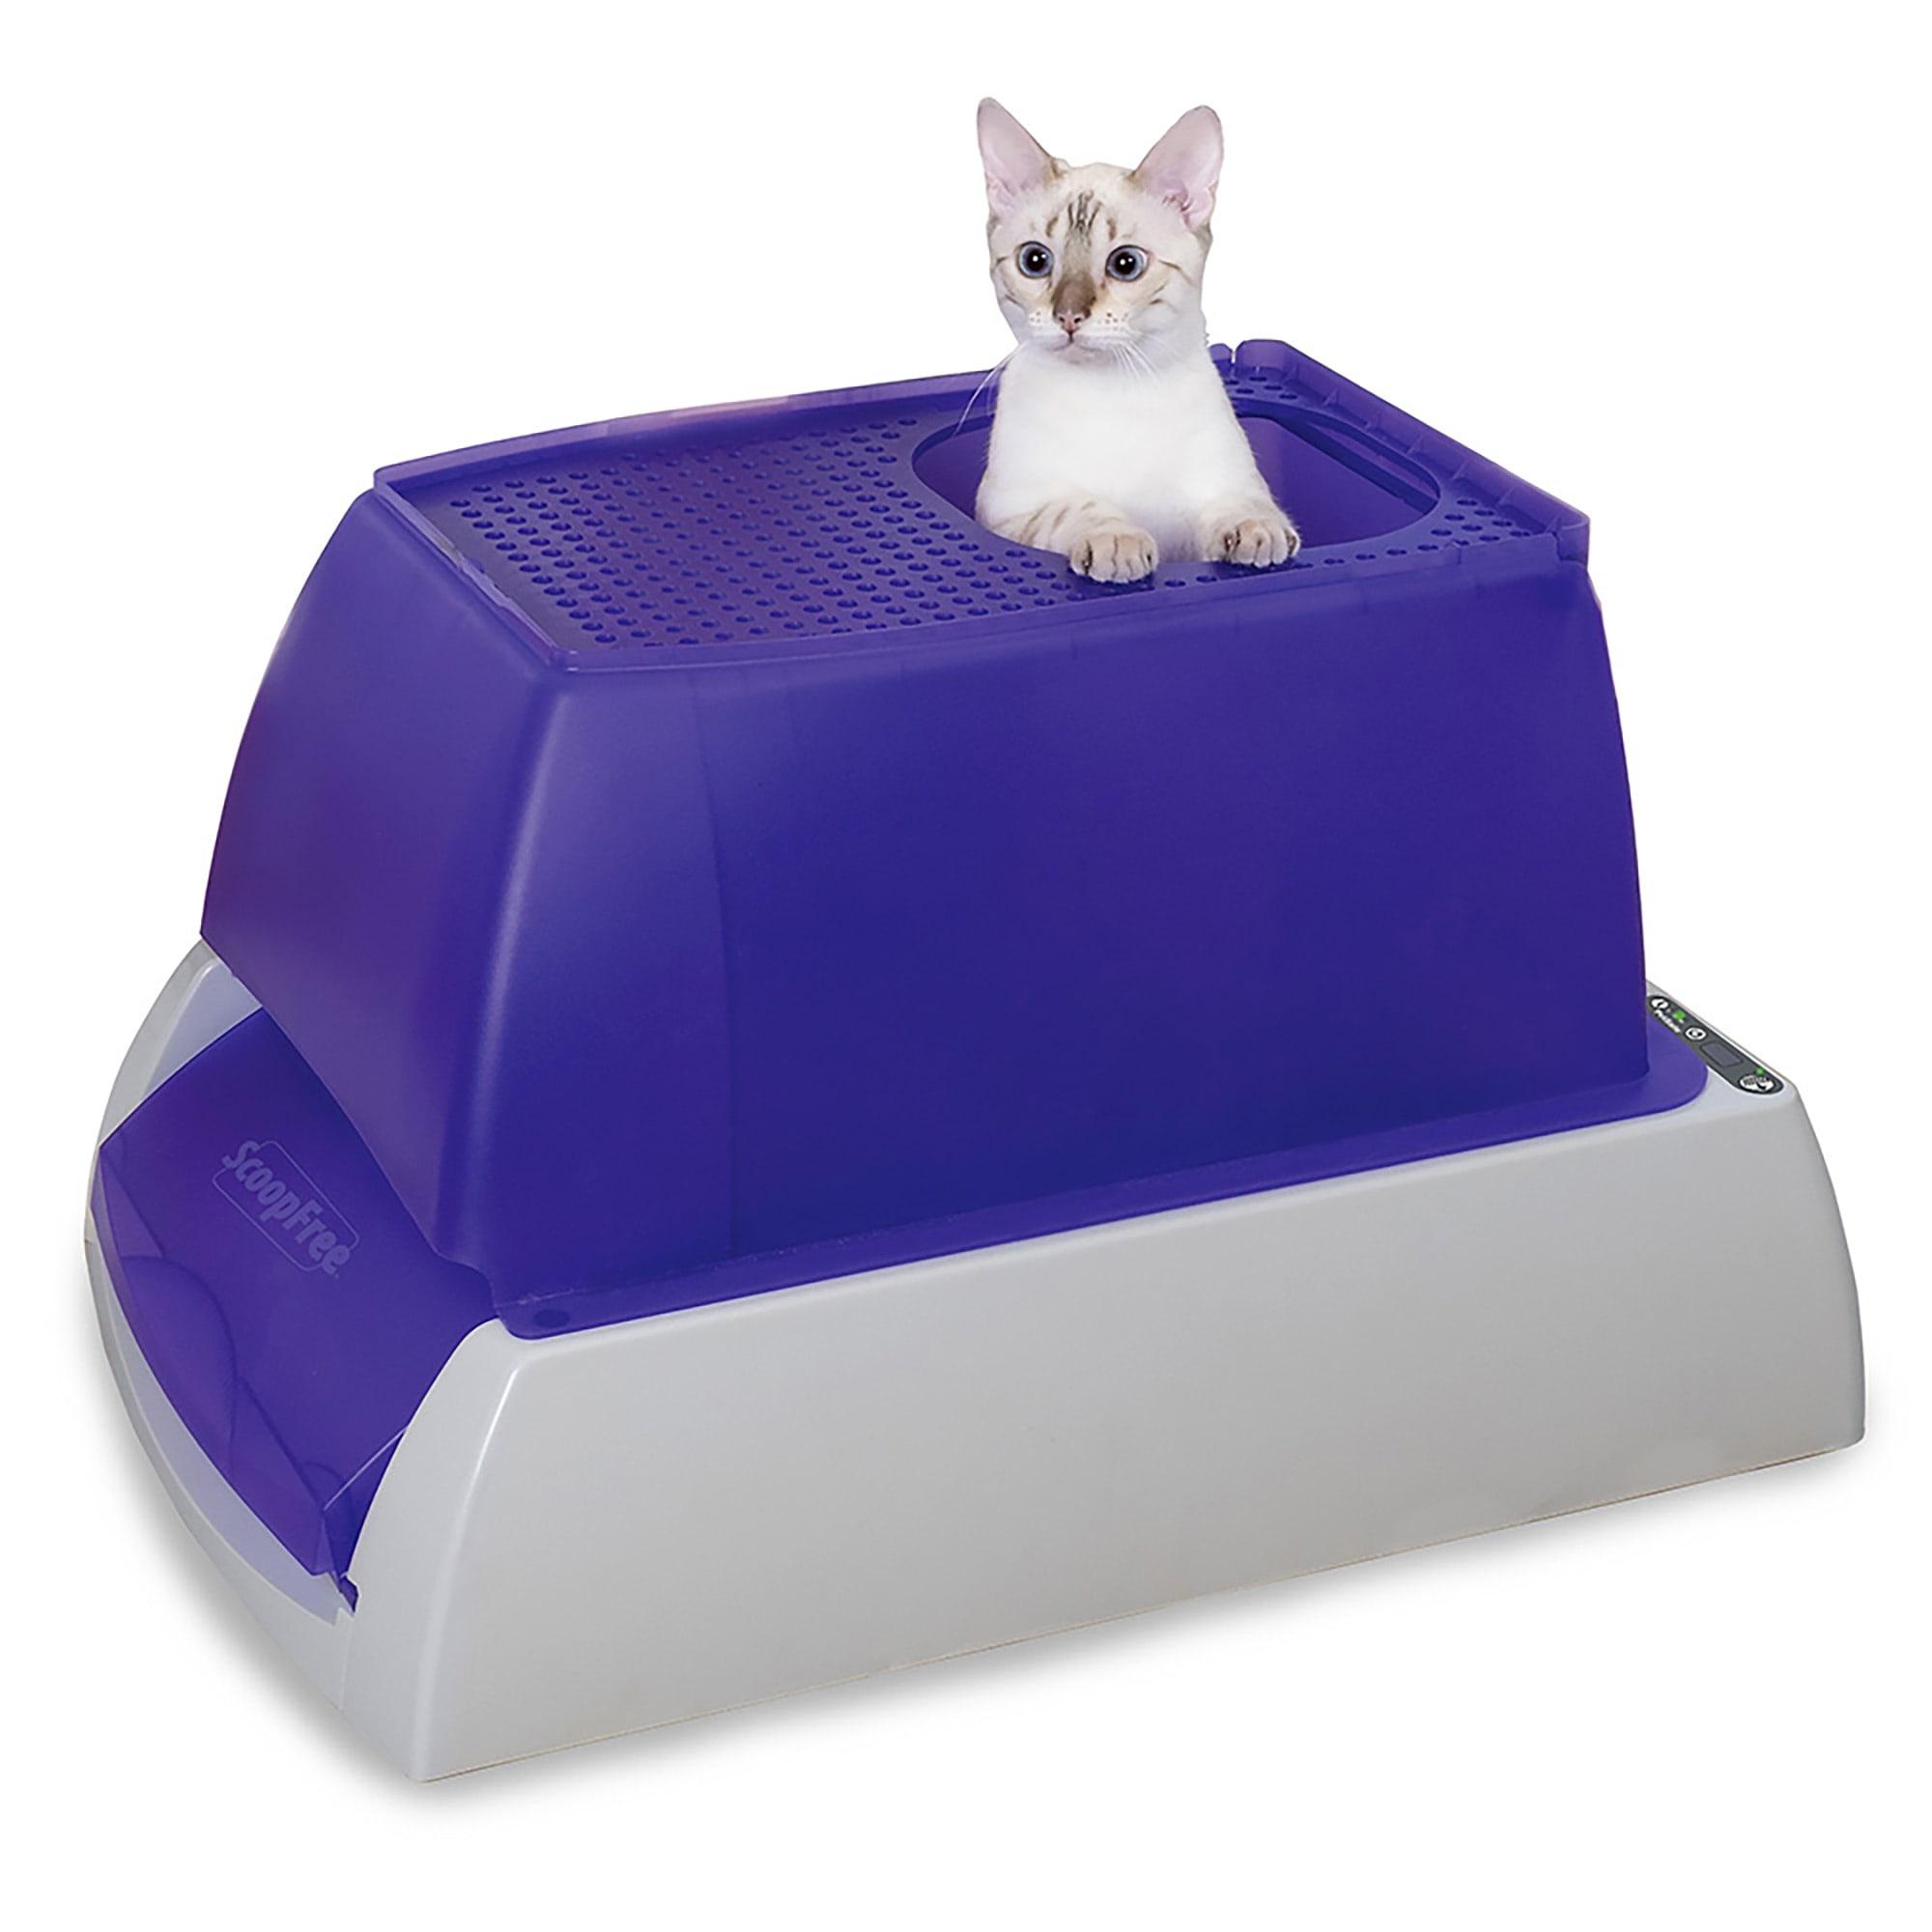 ScoopFree Self-Cleaning Cat Litter Box